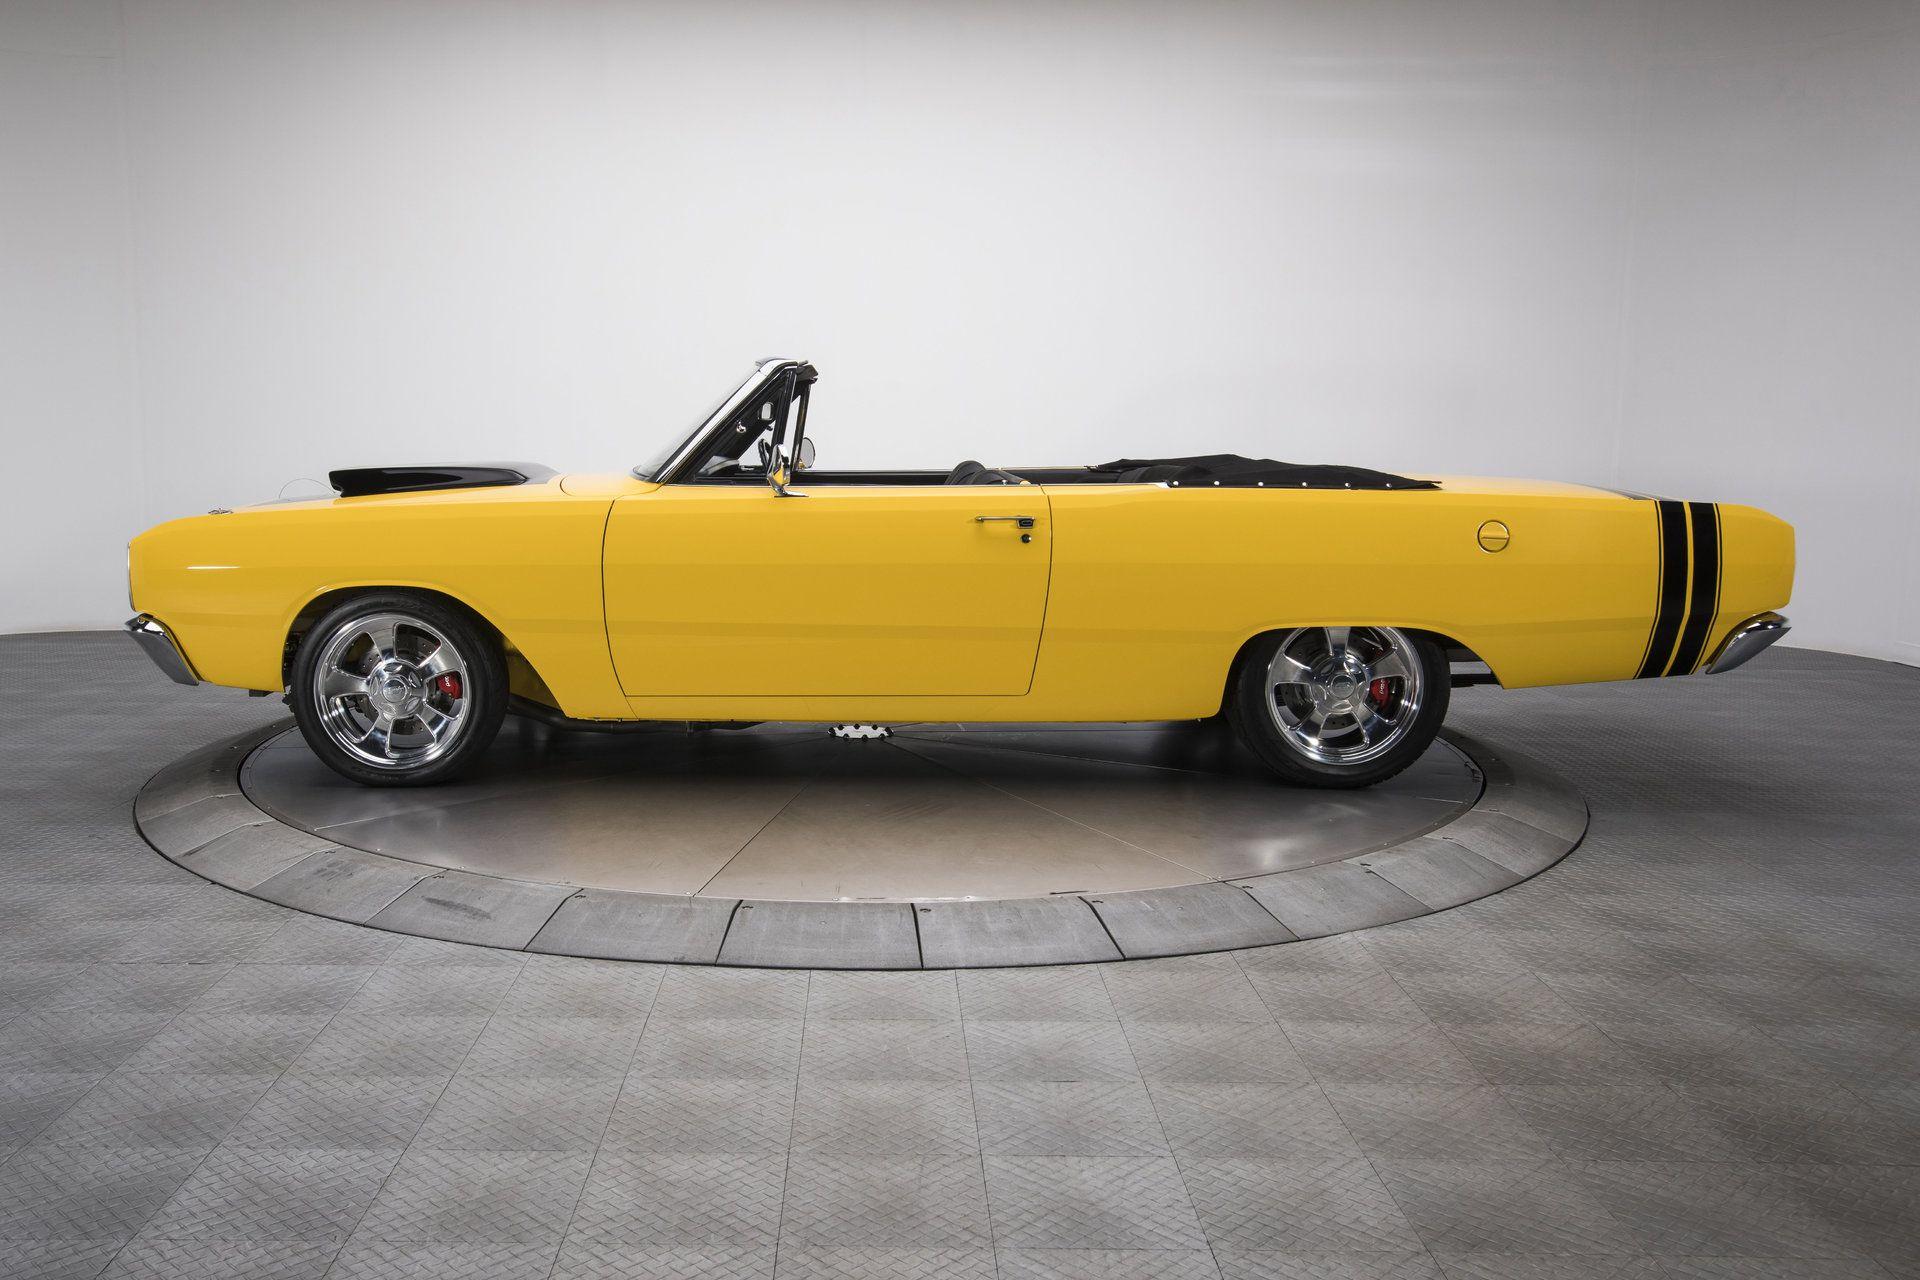 1968 Dodge Dart Ground Up Built Dart Convertible Restomod 610hp